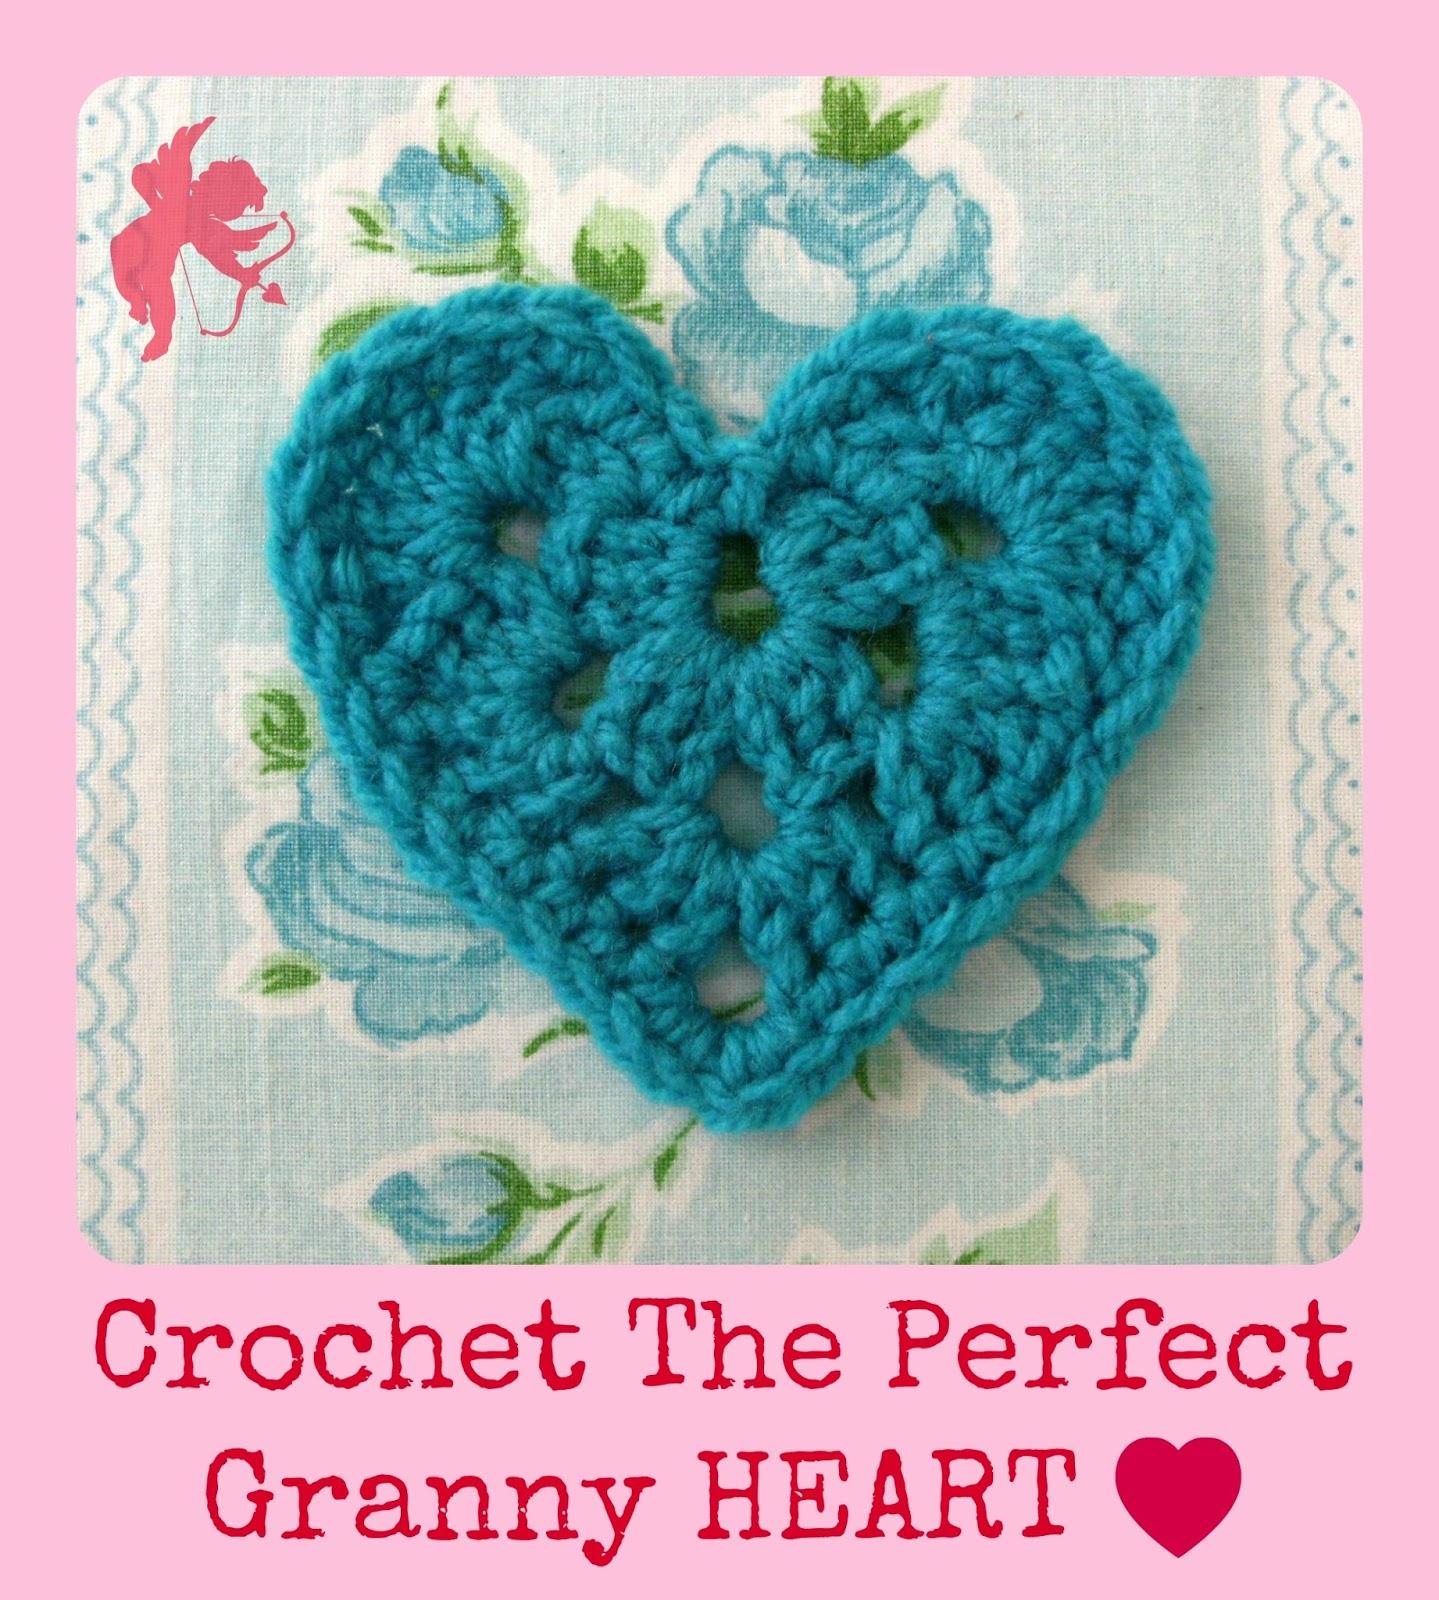 Crochet Granny Square Diagram Excretory System Labeled Alexandra Mackenzie Heart And Garland Pattern